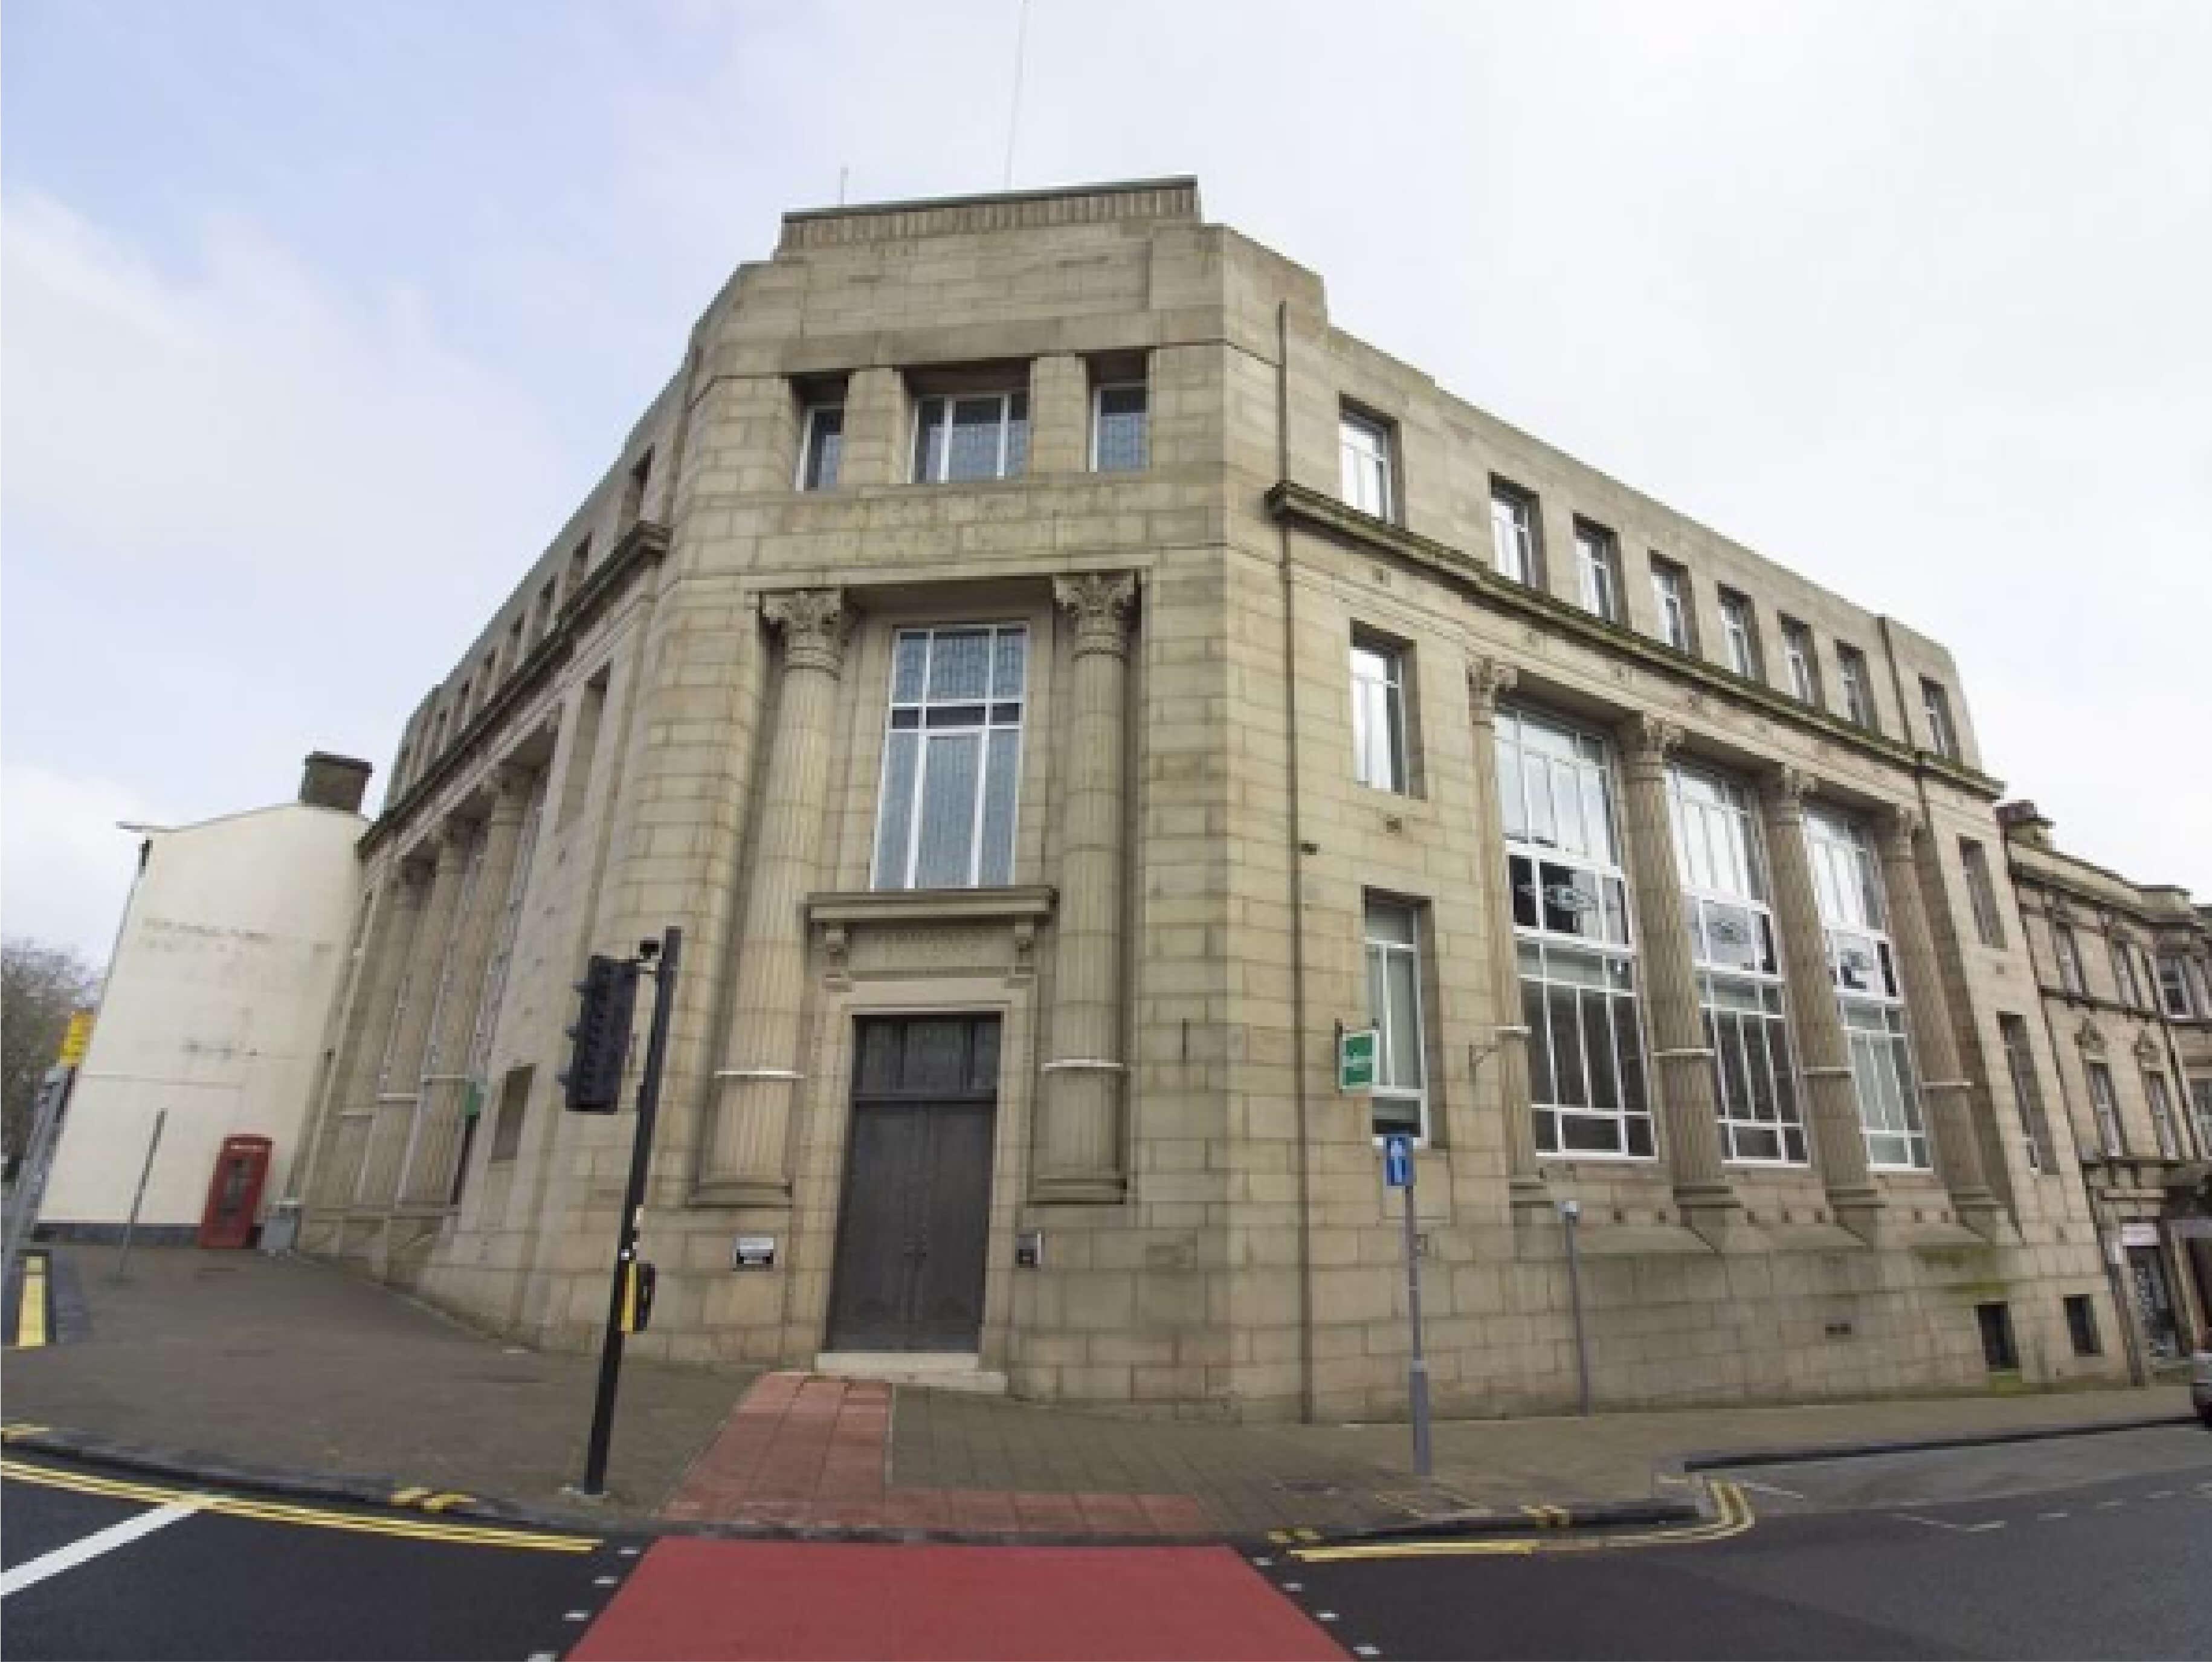 Barnsley_permanent building